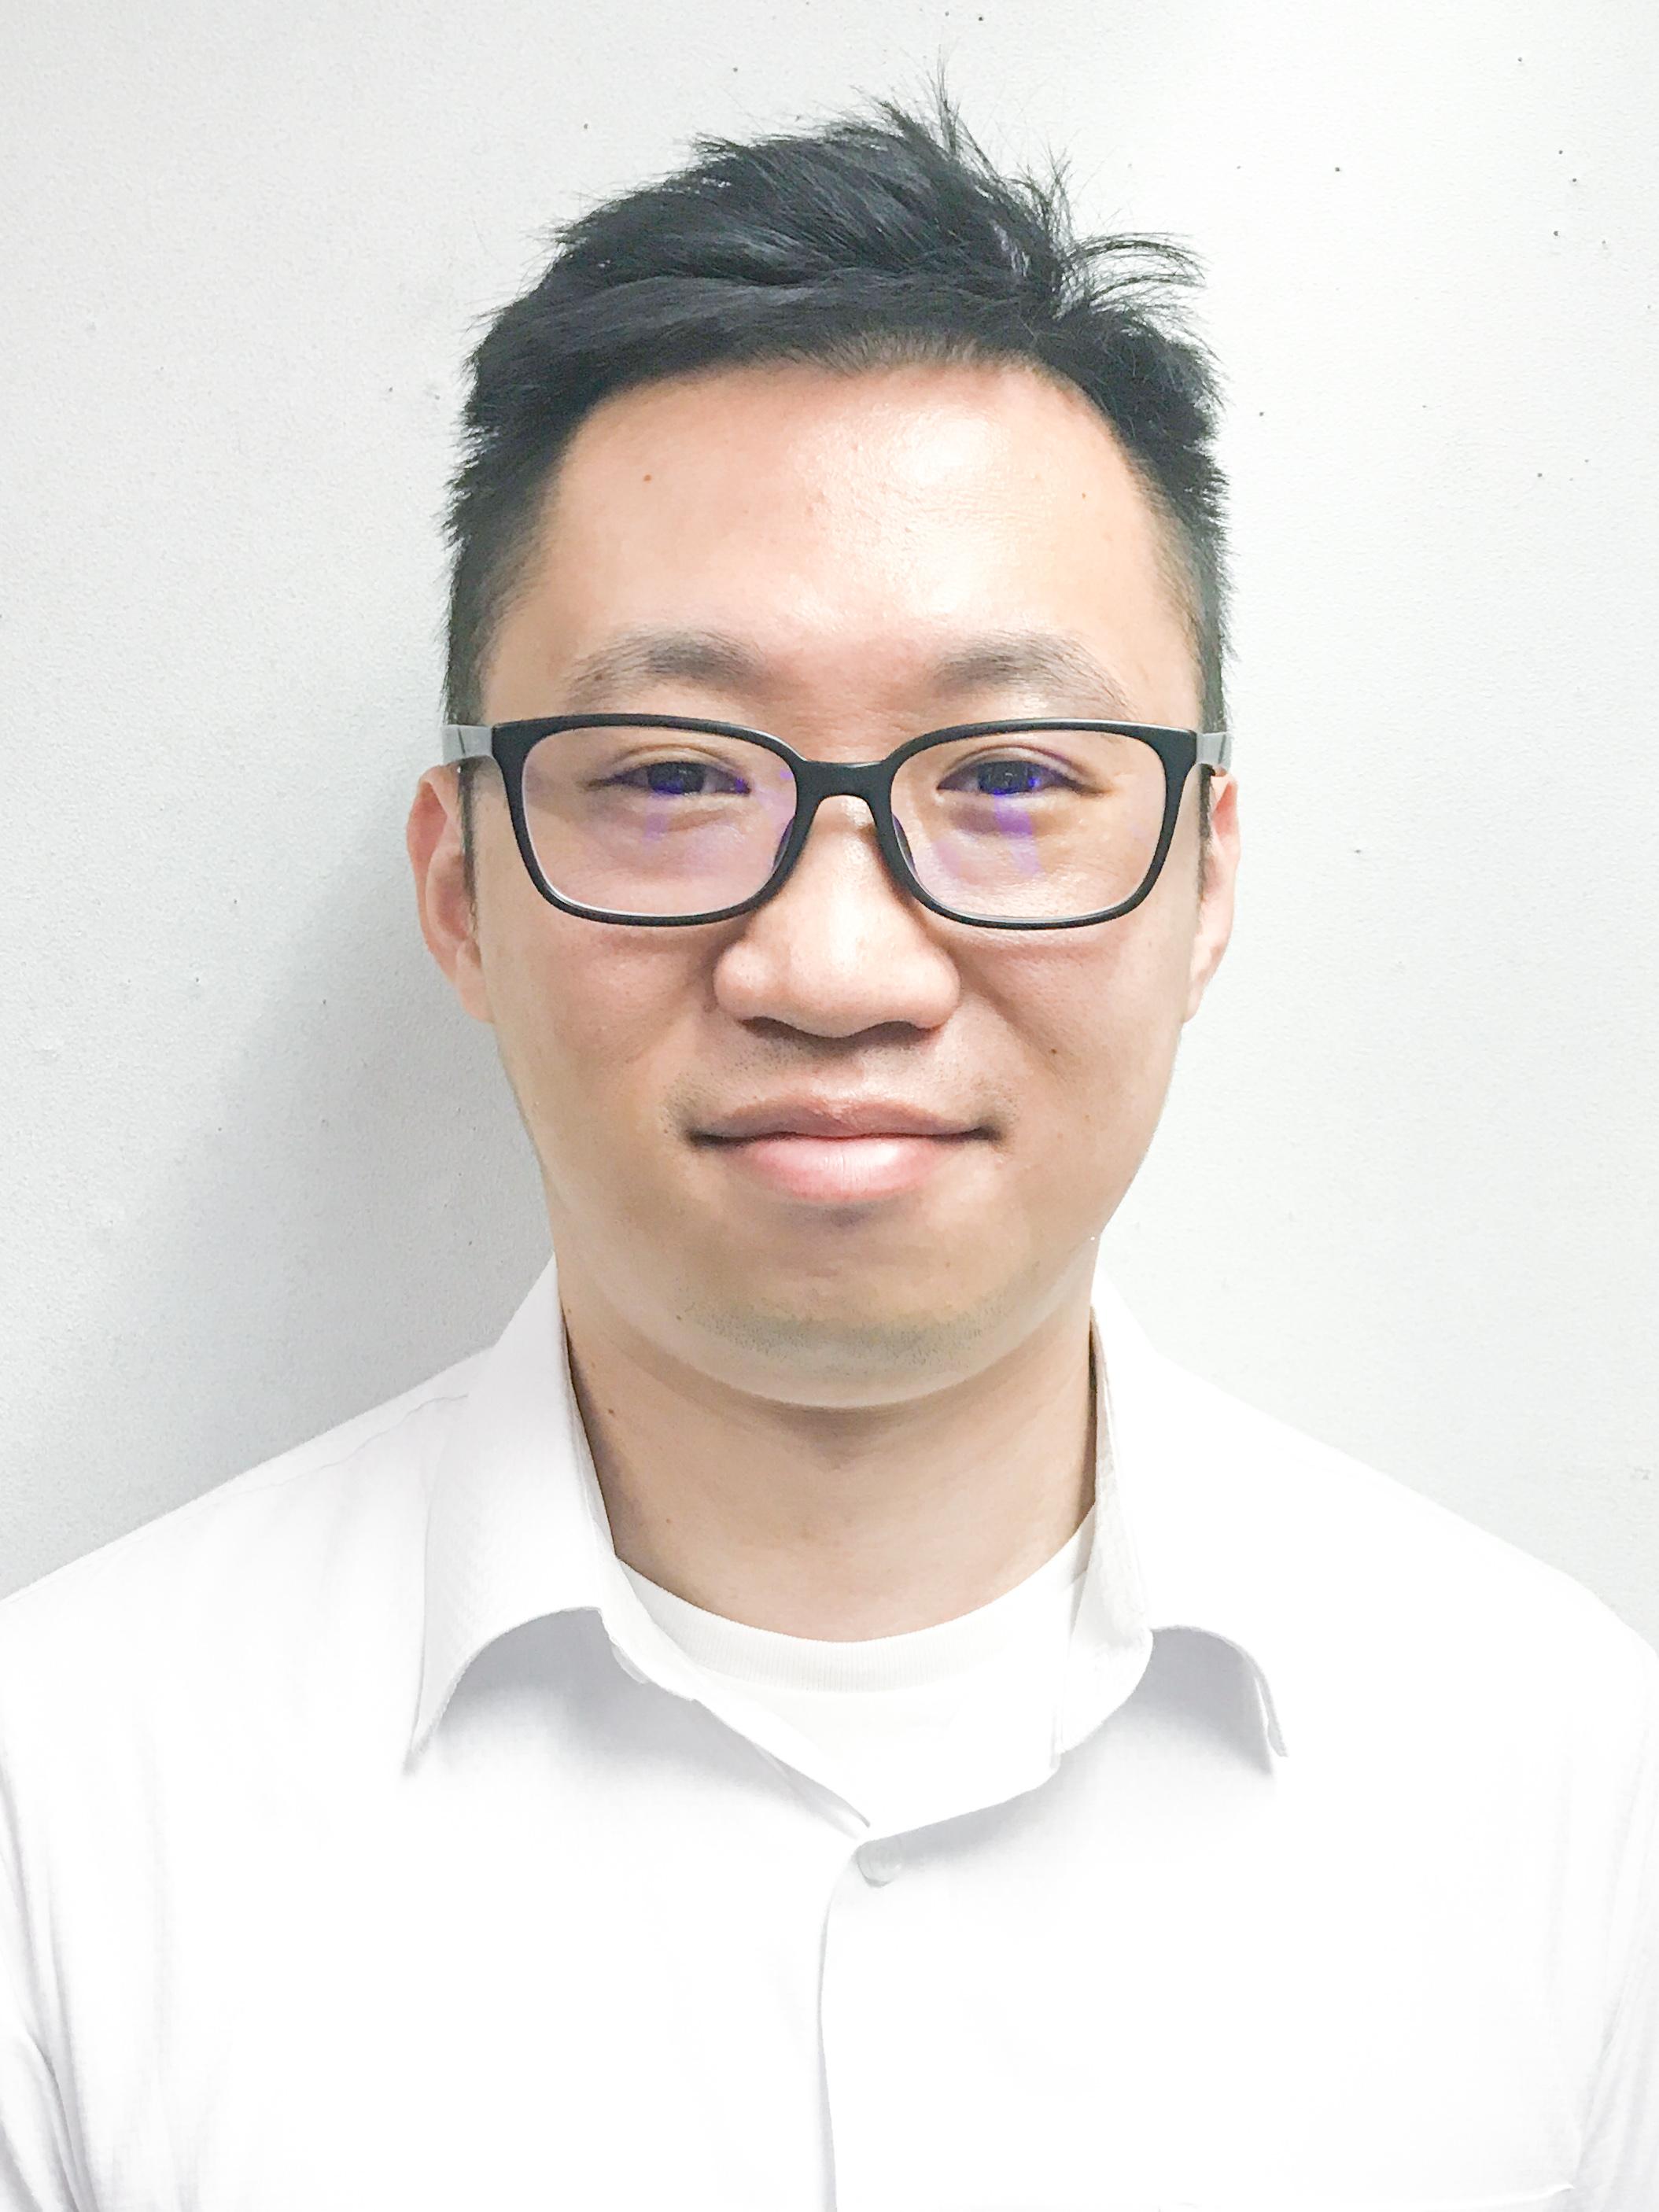 黄家豪先生(Karl Wong)